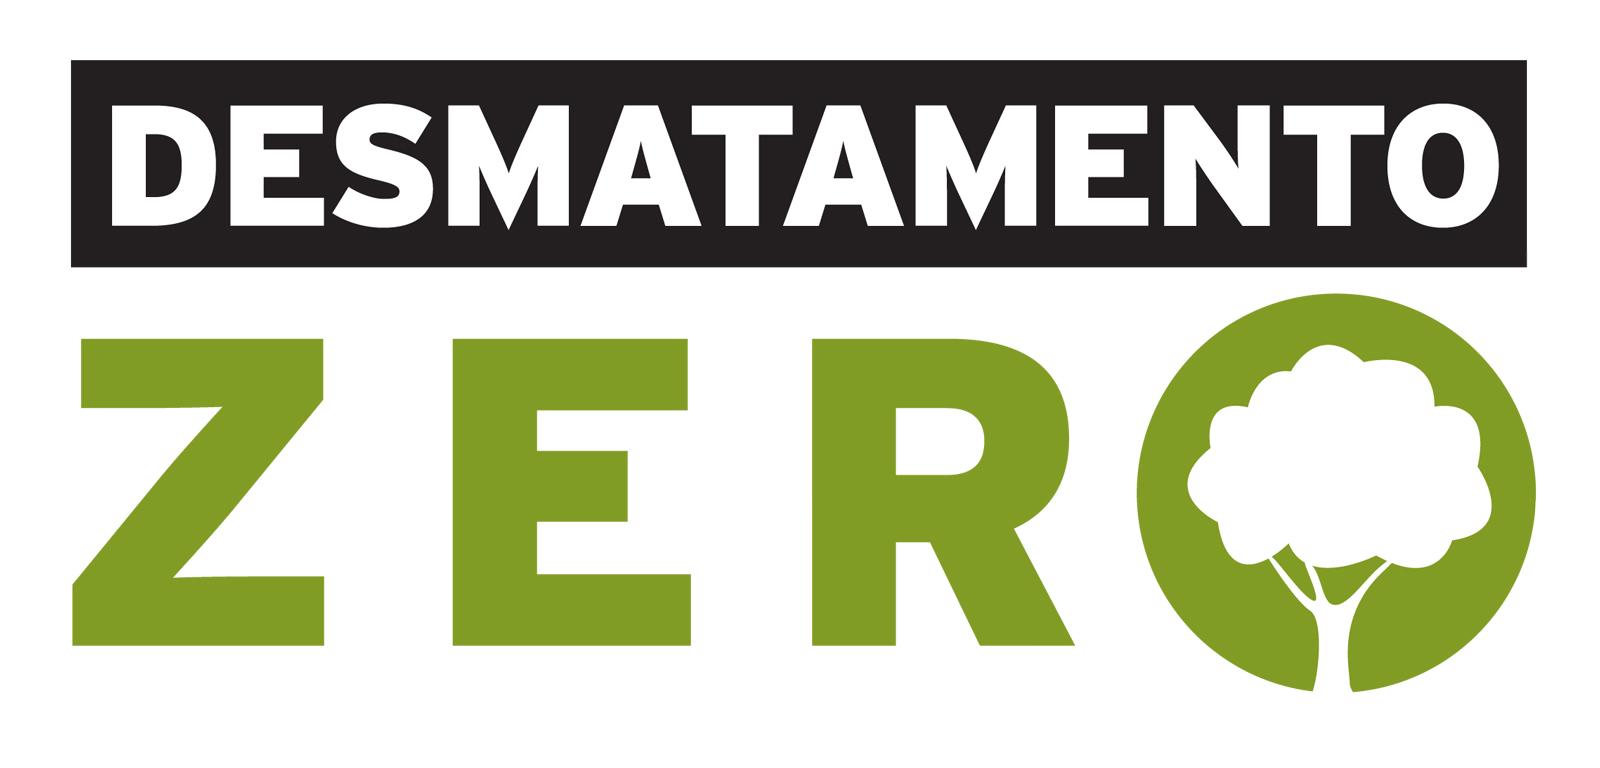 Iniciativa Popular pelo Desmatamento Zero